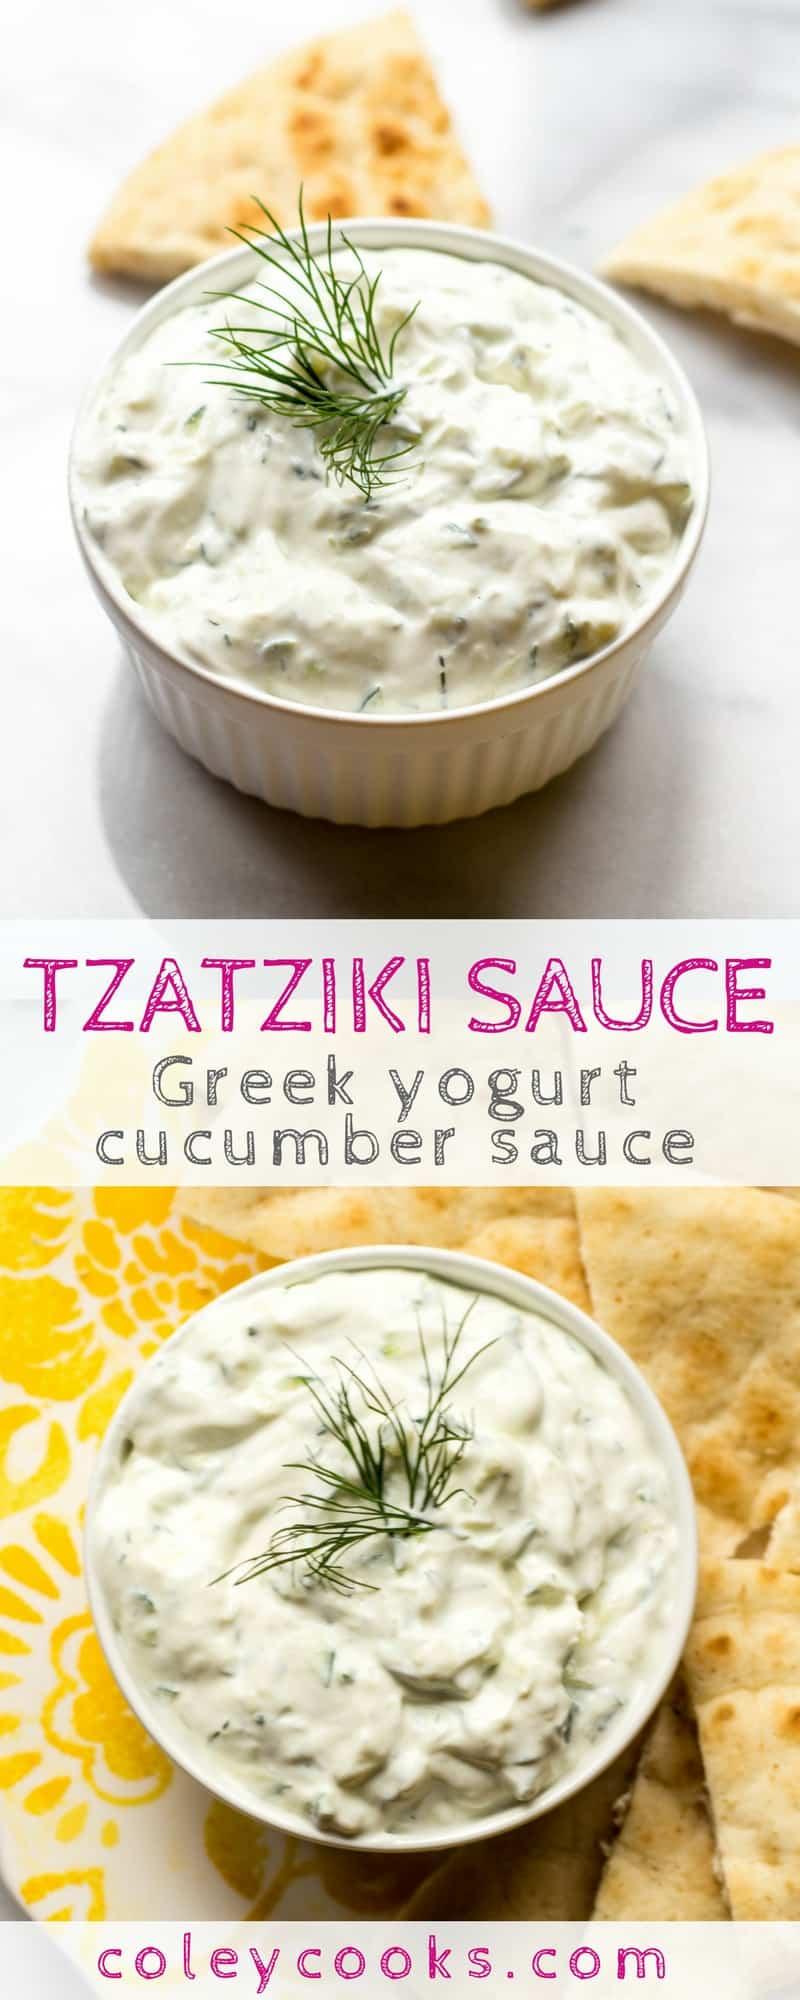 TZATZIKI SAUCE | Easy recipe for Greek yogurt cucumber sauce Tzatziki! Creamy, refreshing, and wonderful with pita, on gyros, souvlaki, falafel, or your favorite Greek recipe! #glutenfree #vegetarian | ColeyCooks.com